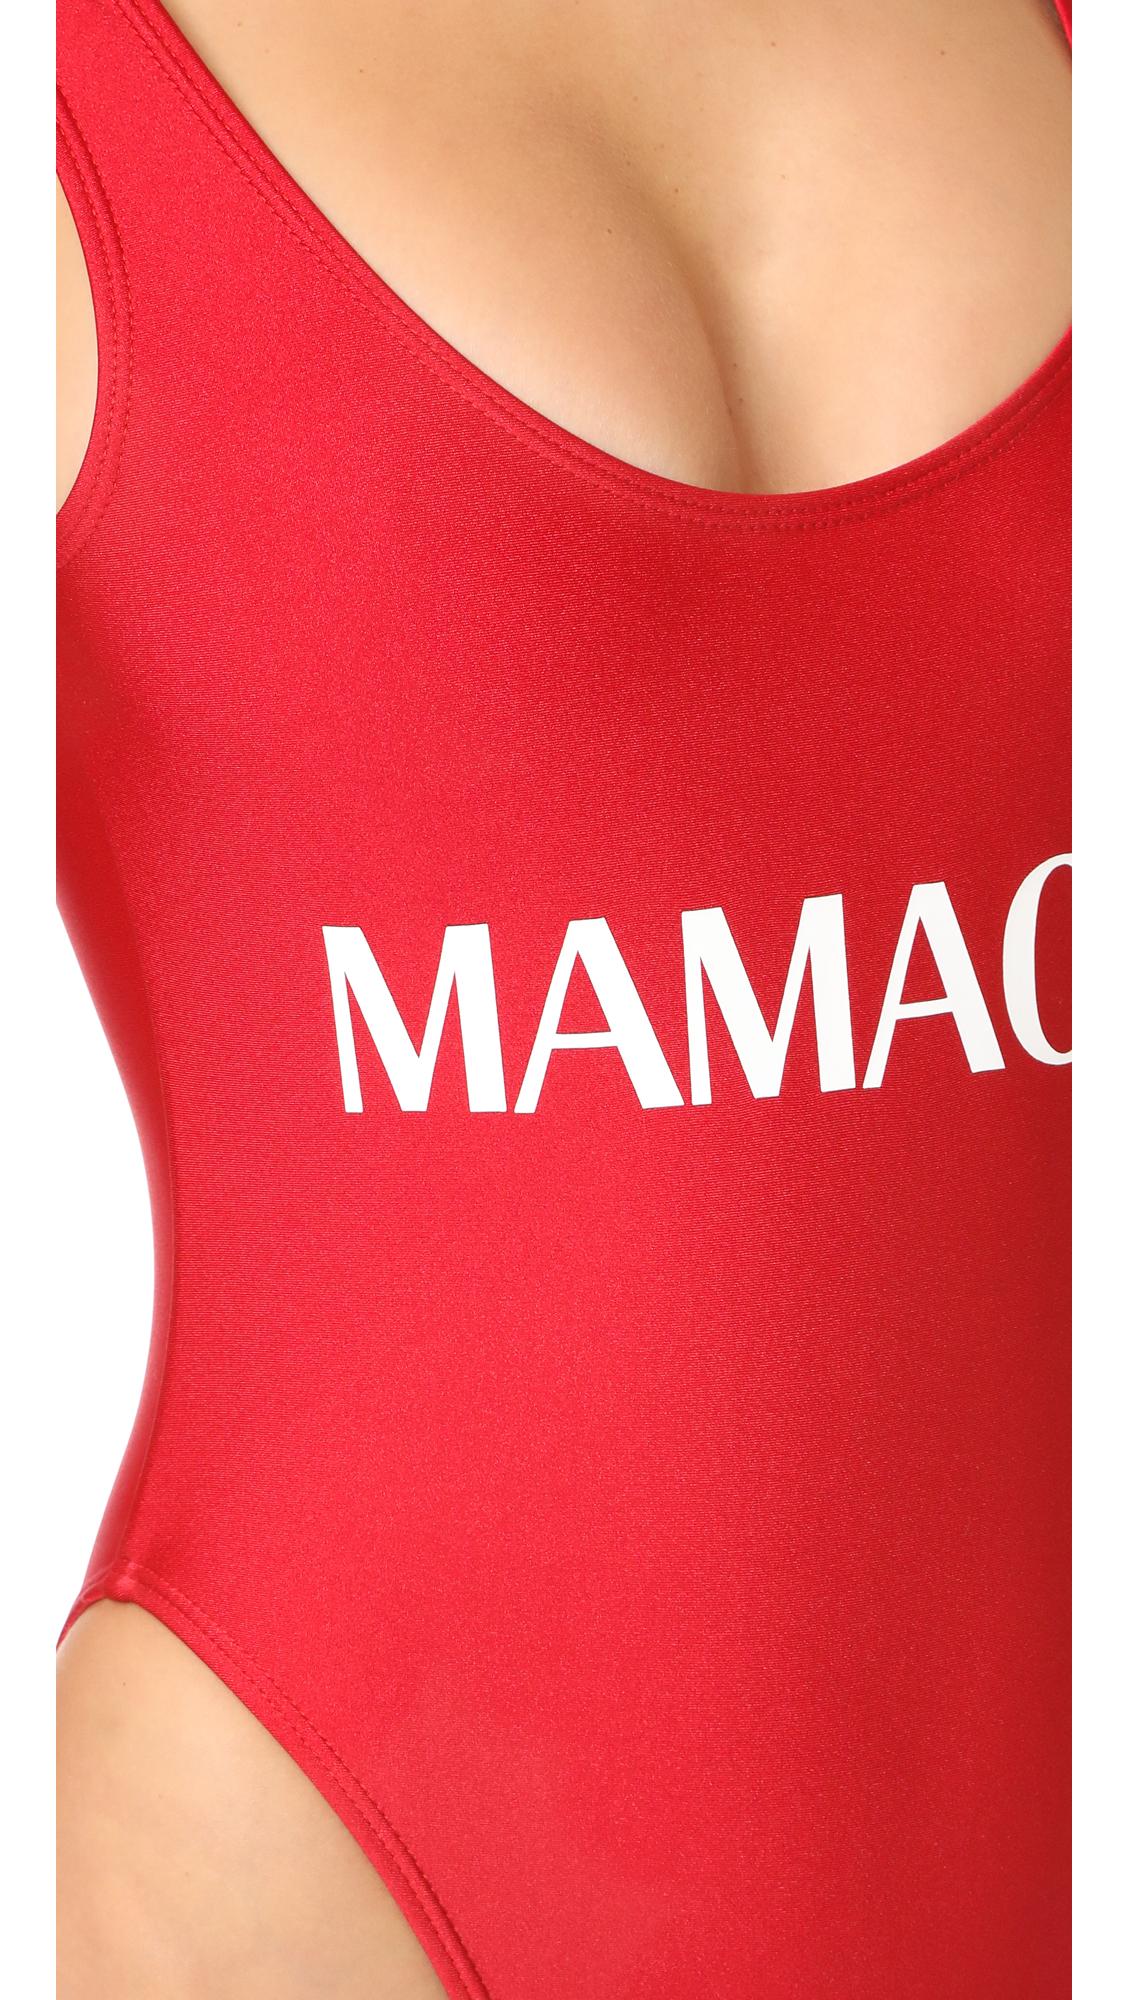 74c000ef8a7 Private Party Mamacita One Piece | SHOPBOP